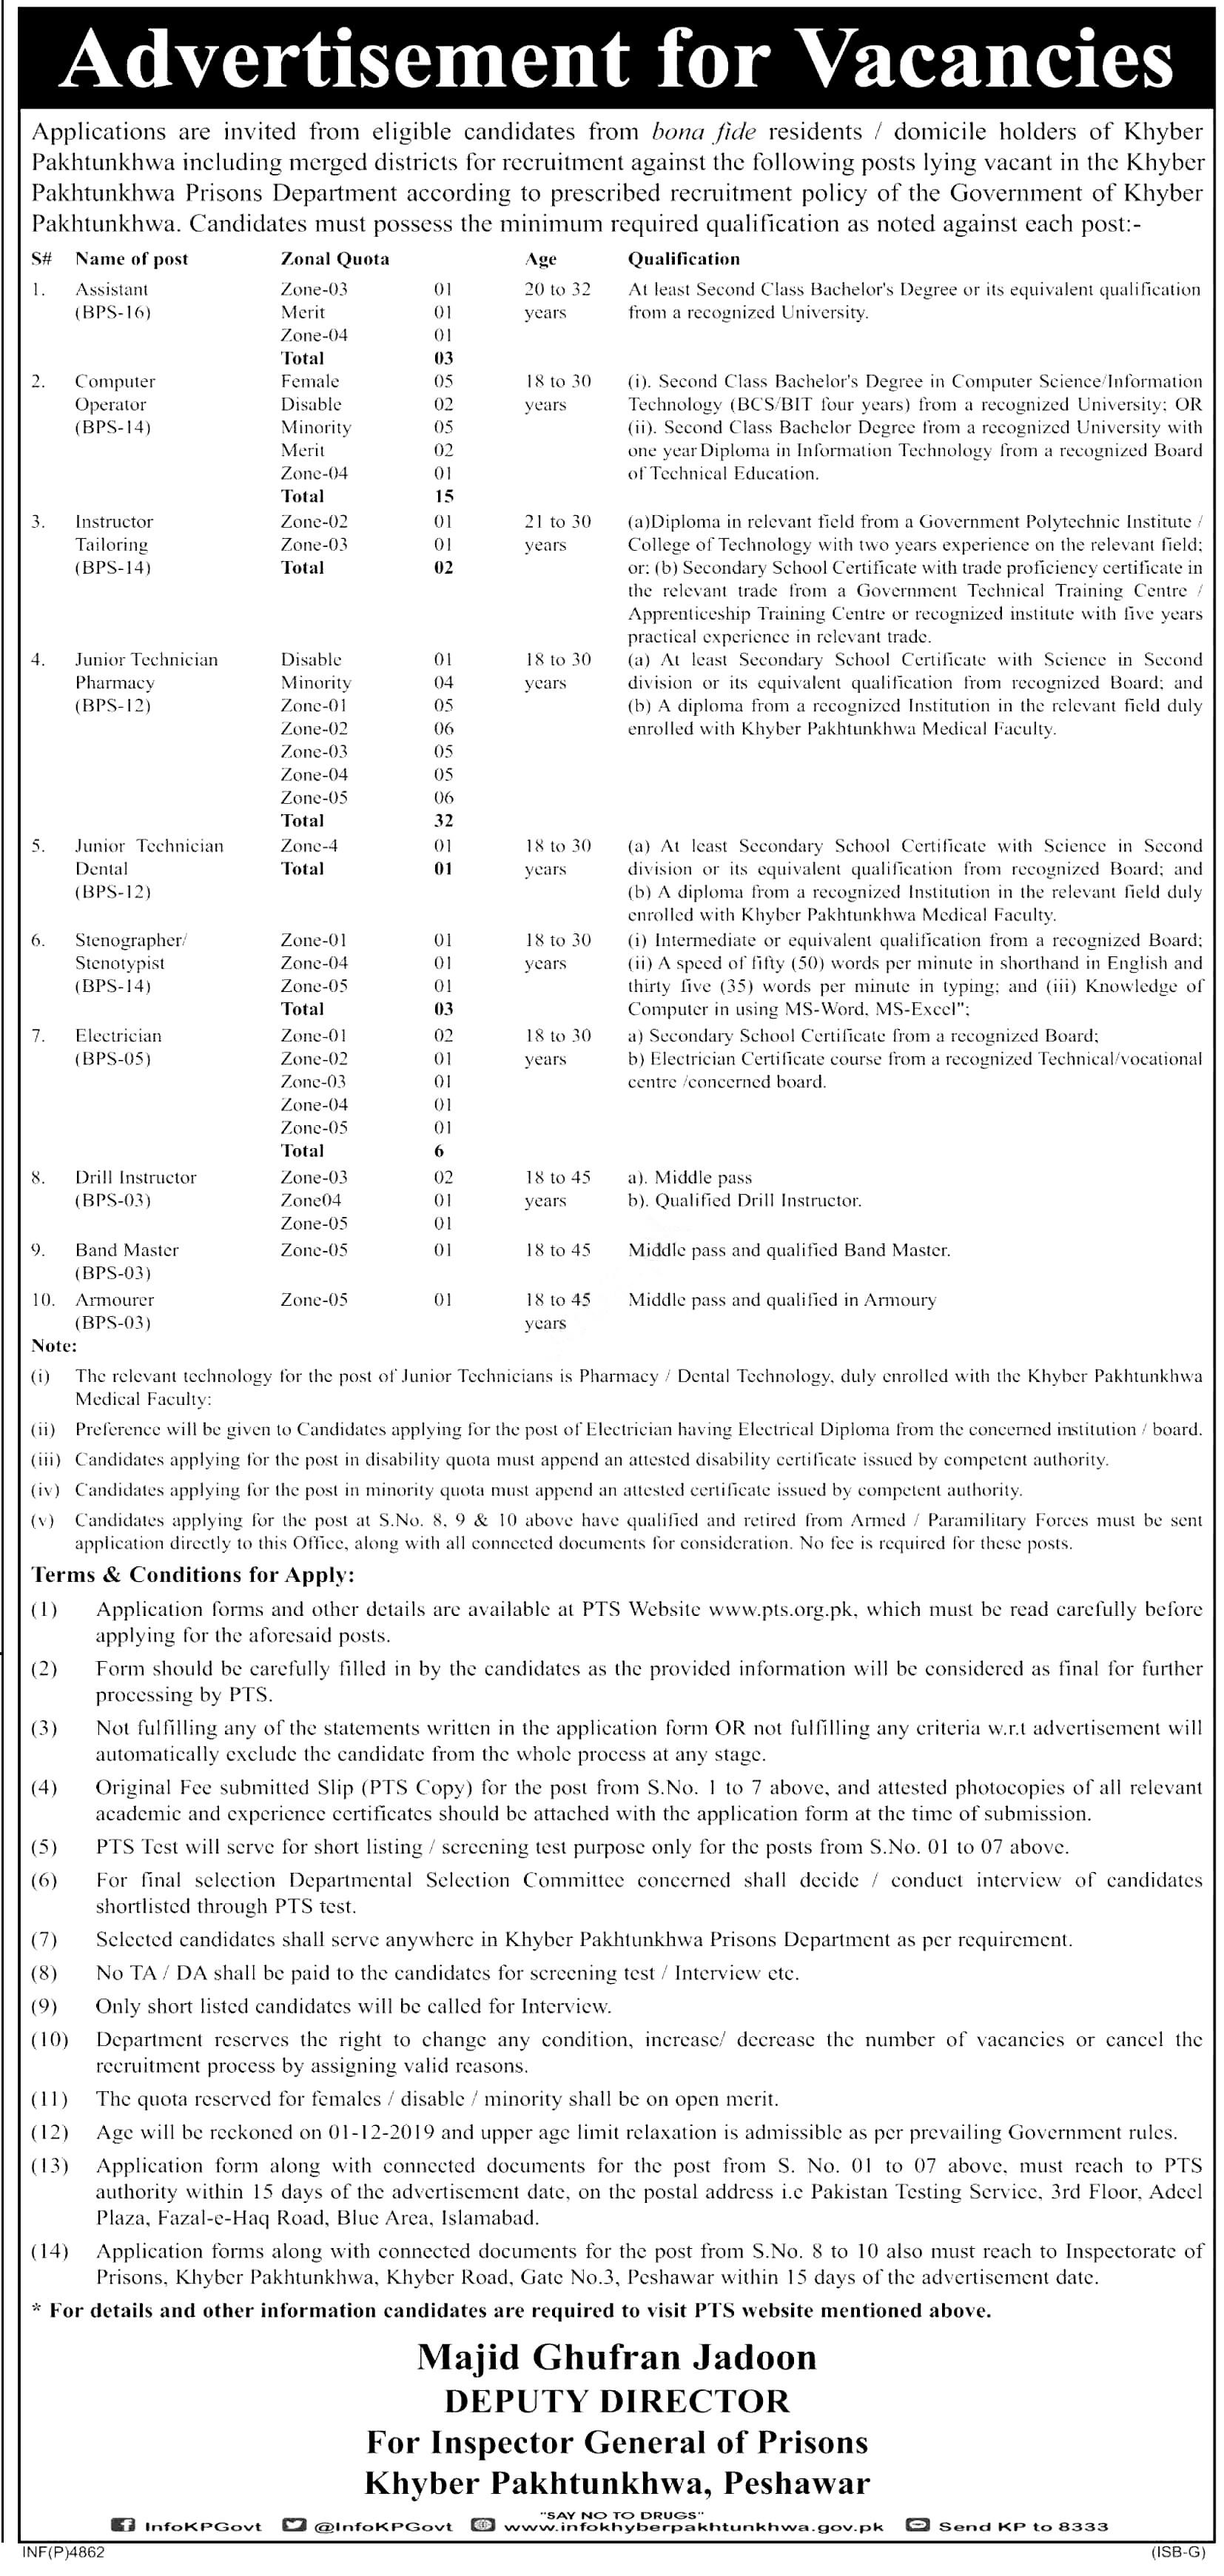 KPK Prisons Department PTS Jobs 2019 Application Form Roll No Slip download online